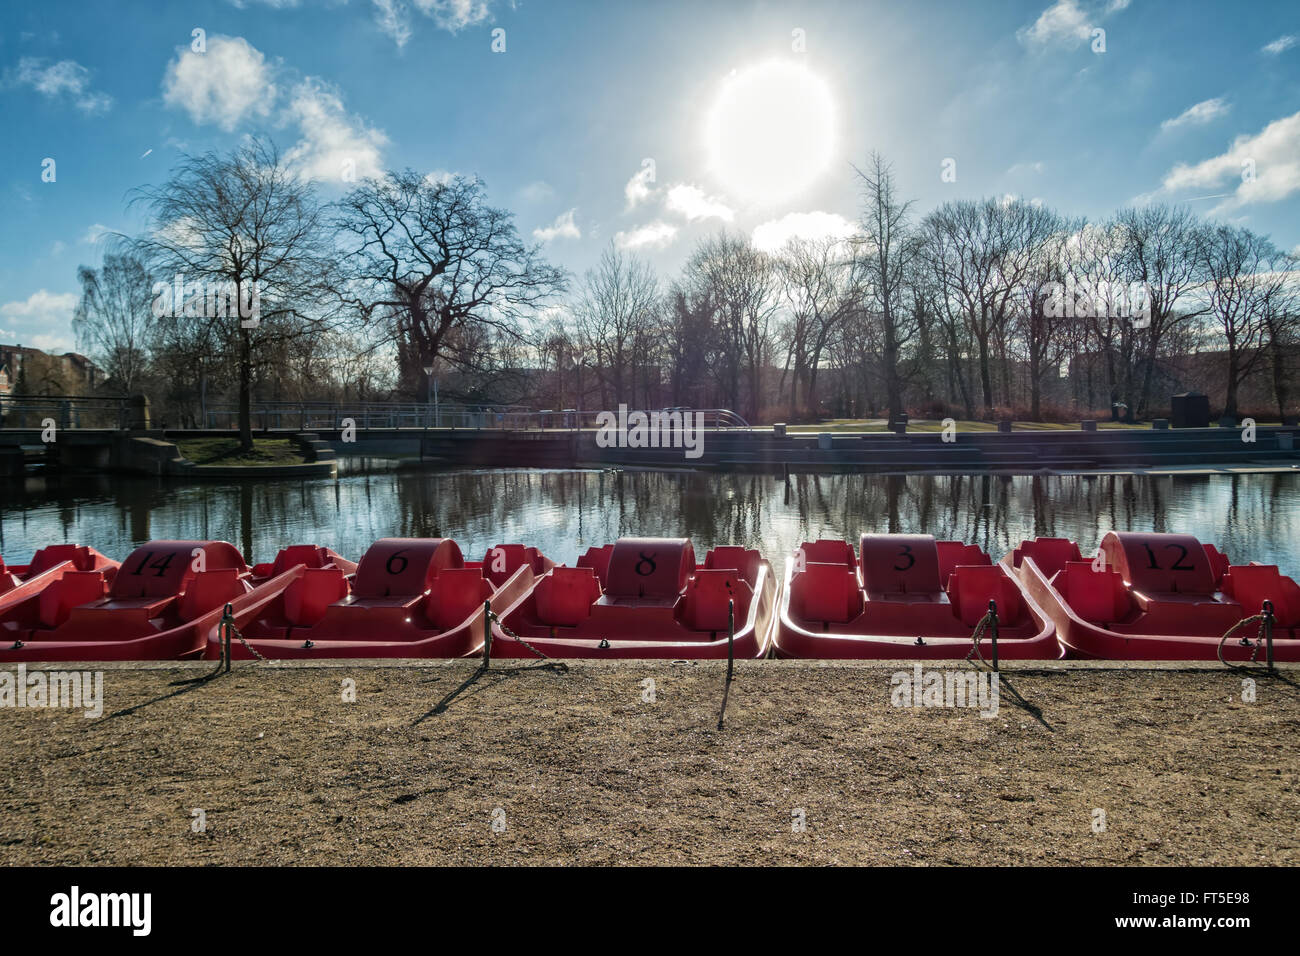 Pedal punts in Odense river, Denmark - Stock Image